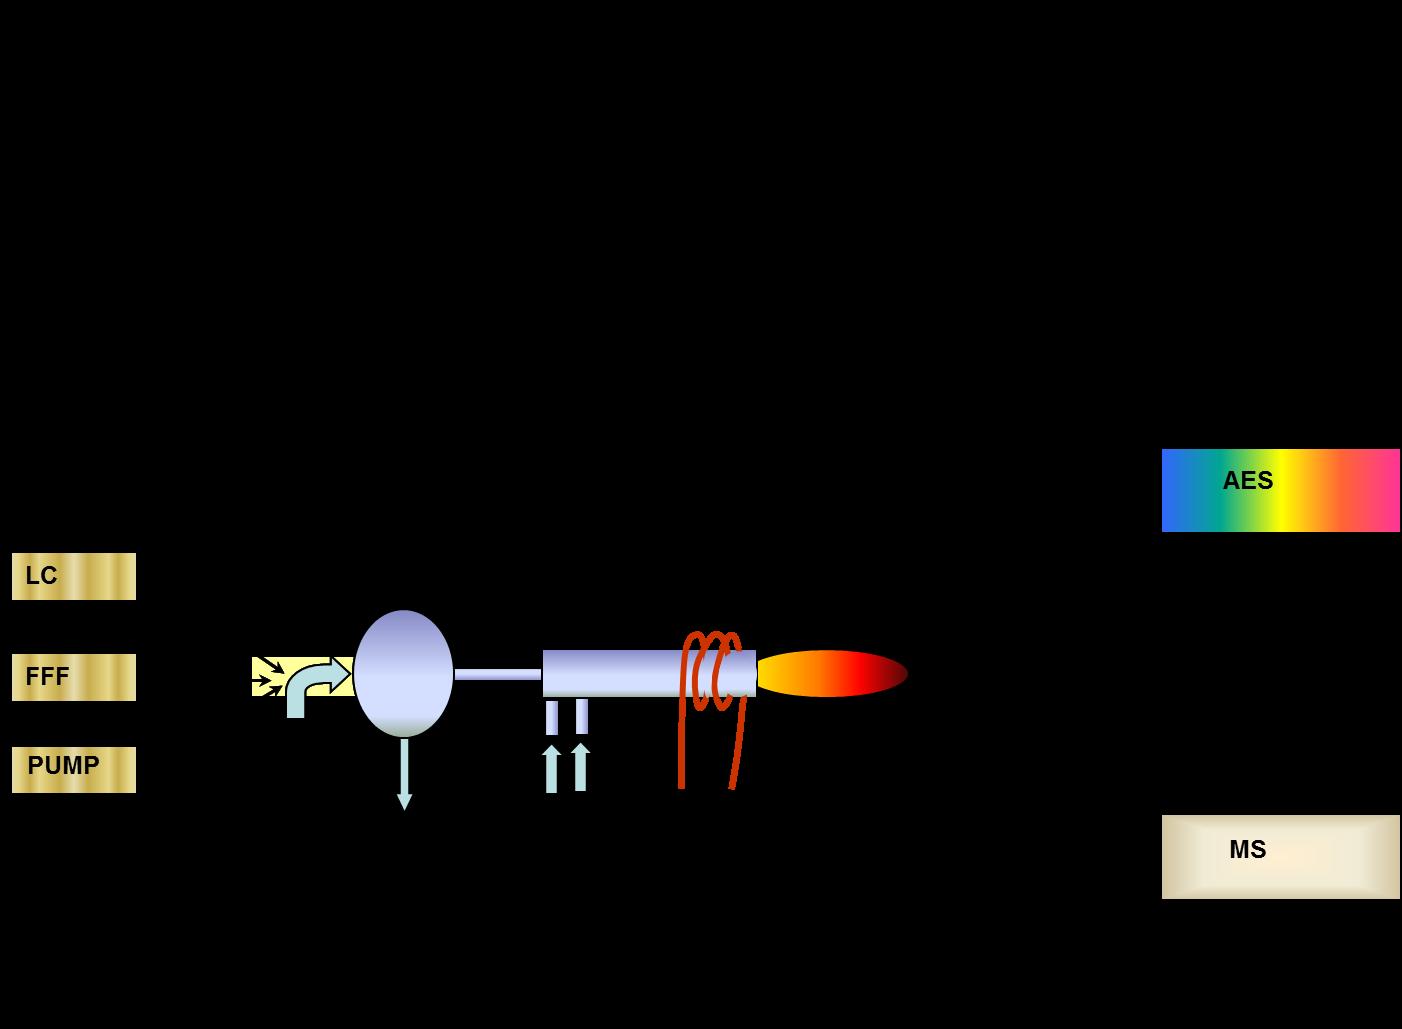 In image explaining plasma spectrometry.